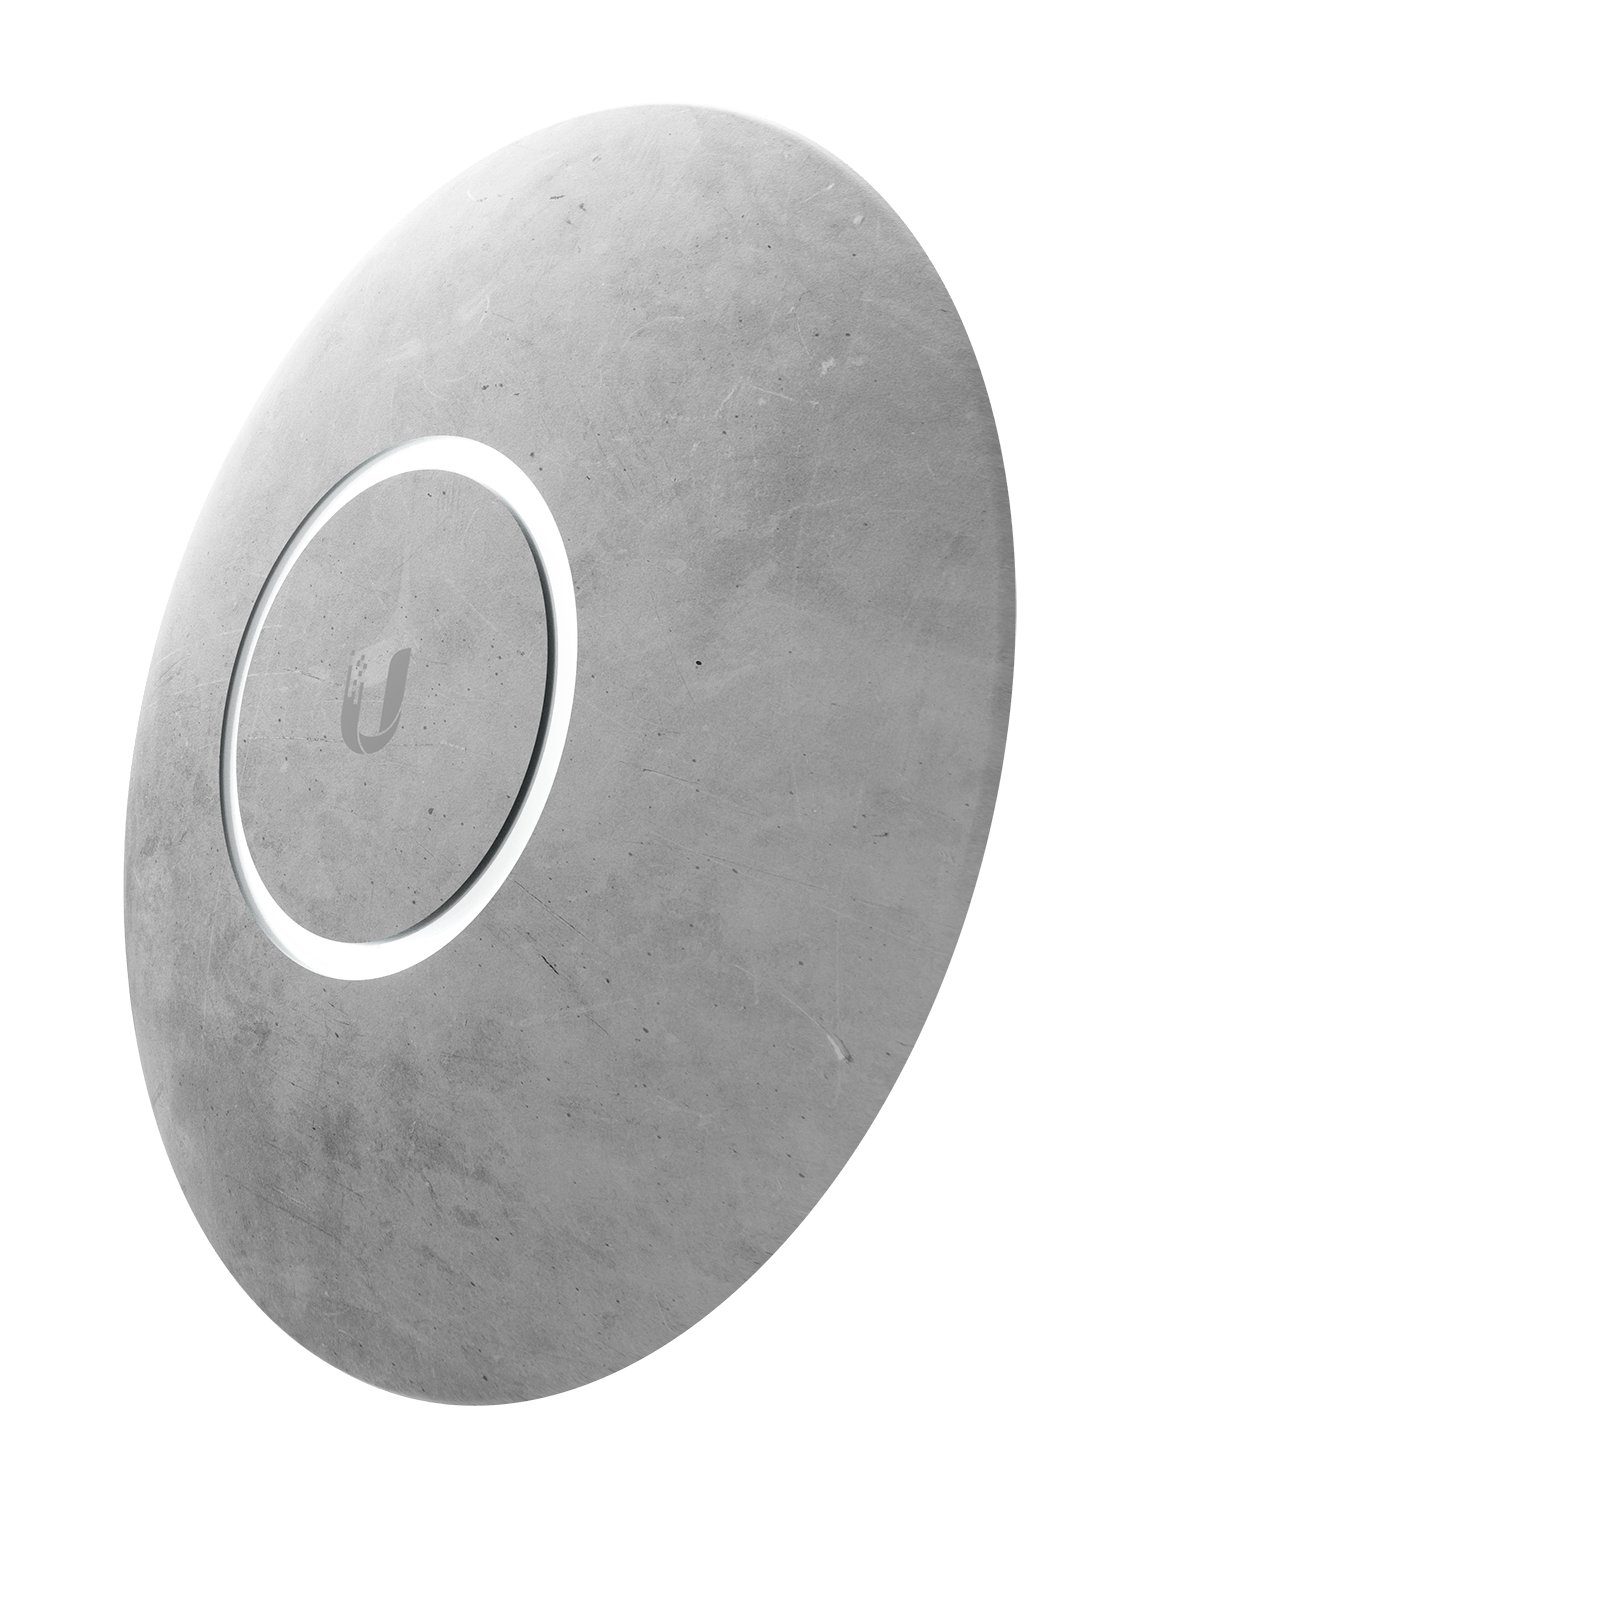 nHD-cover-Concrete-3 Photo#1